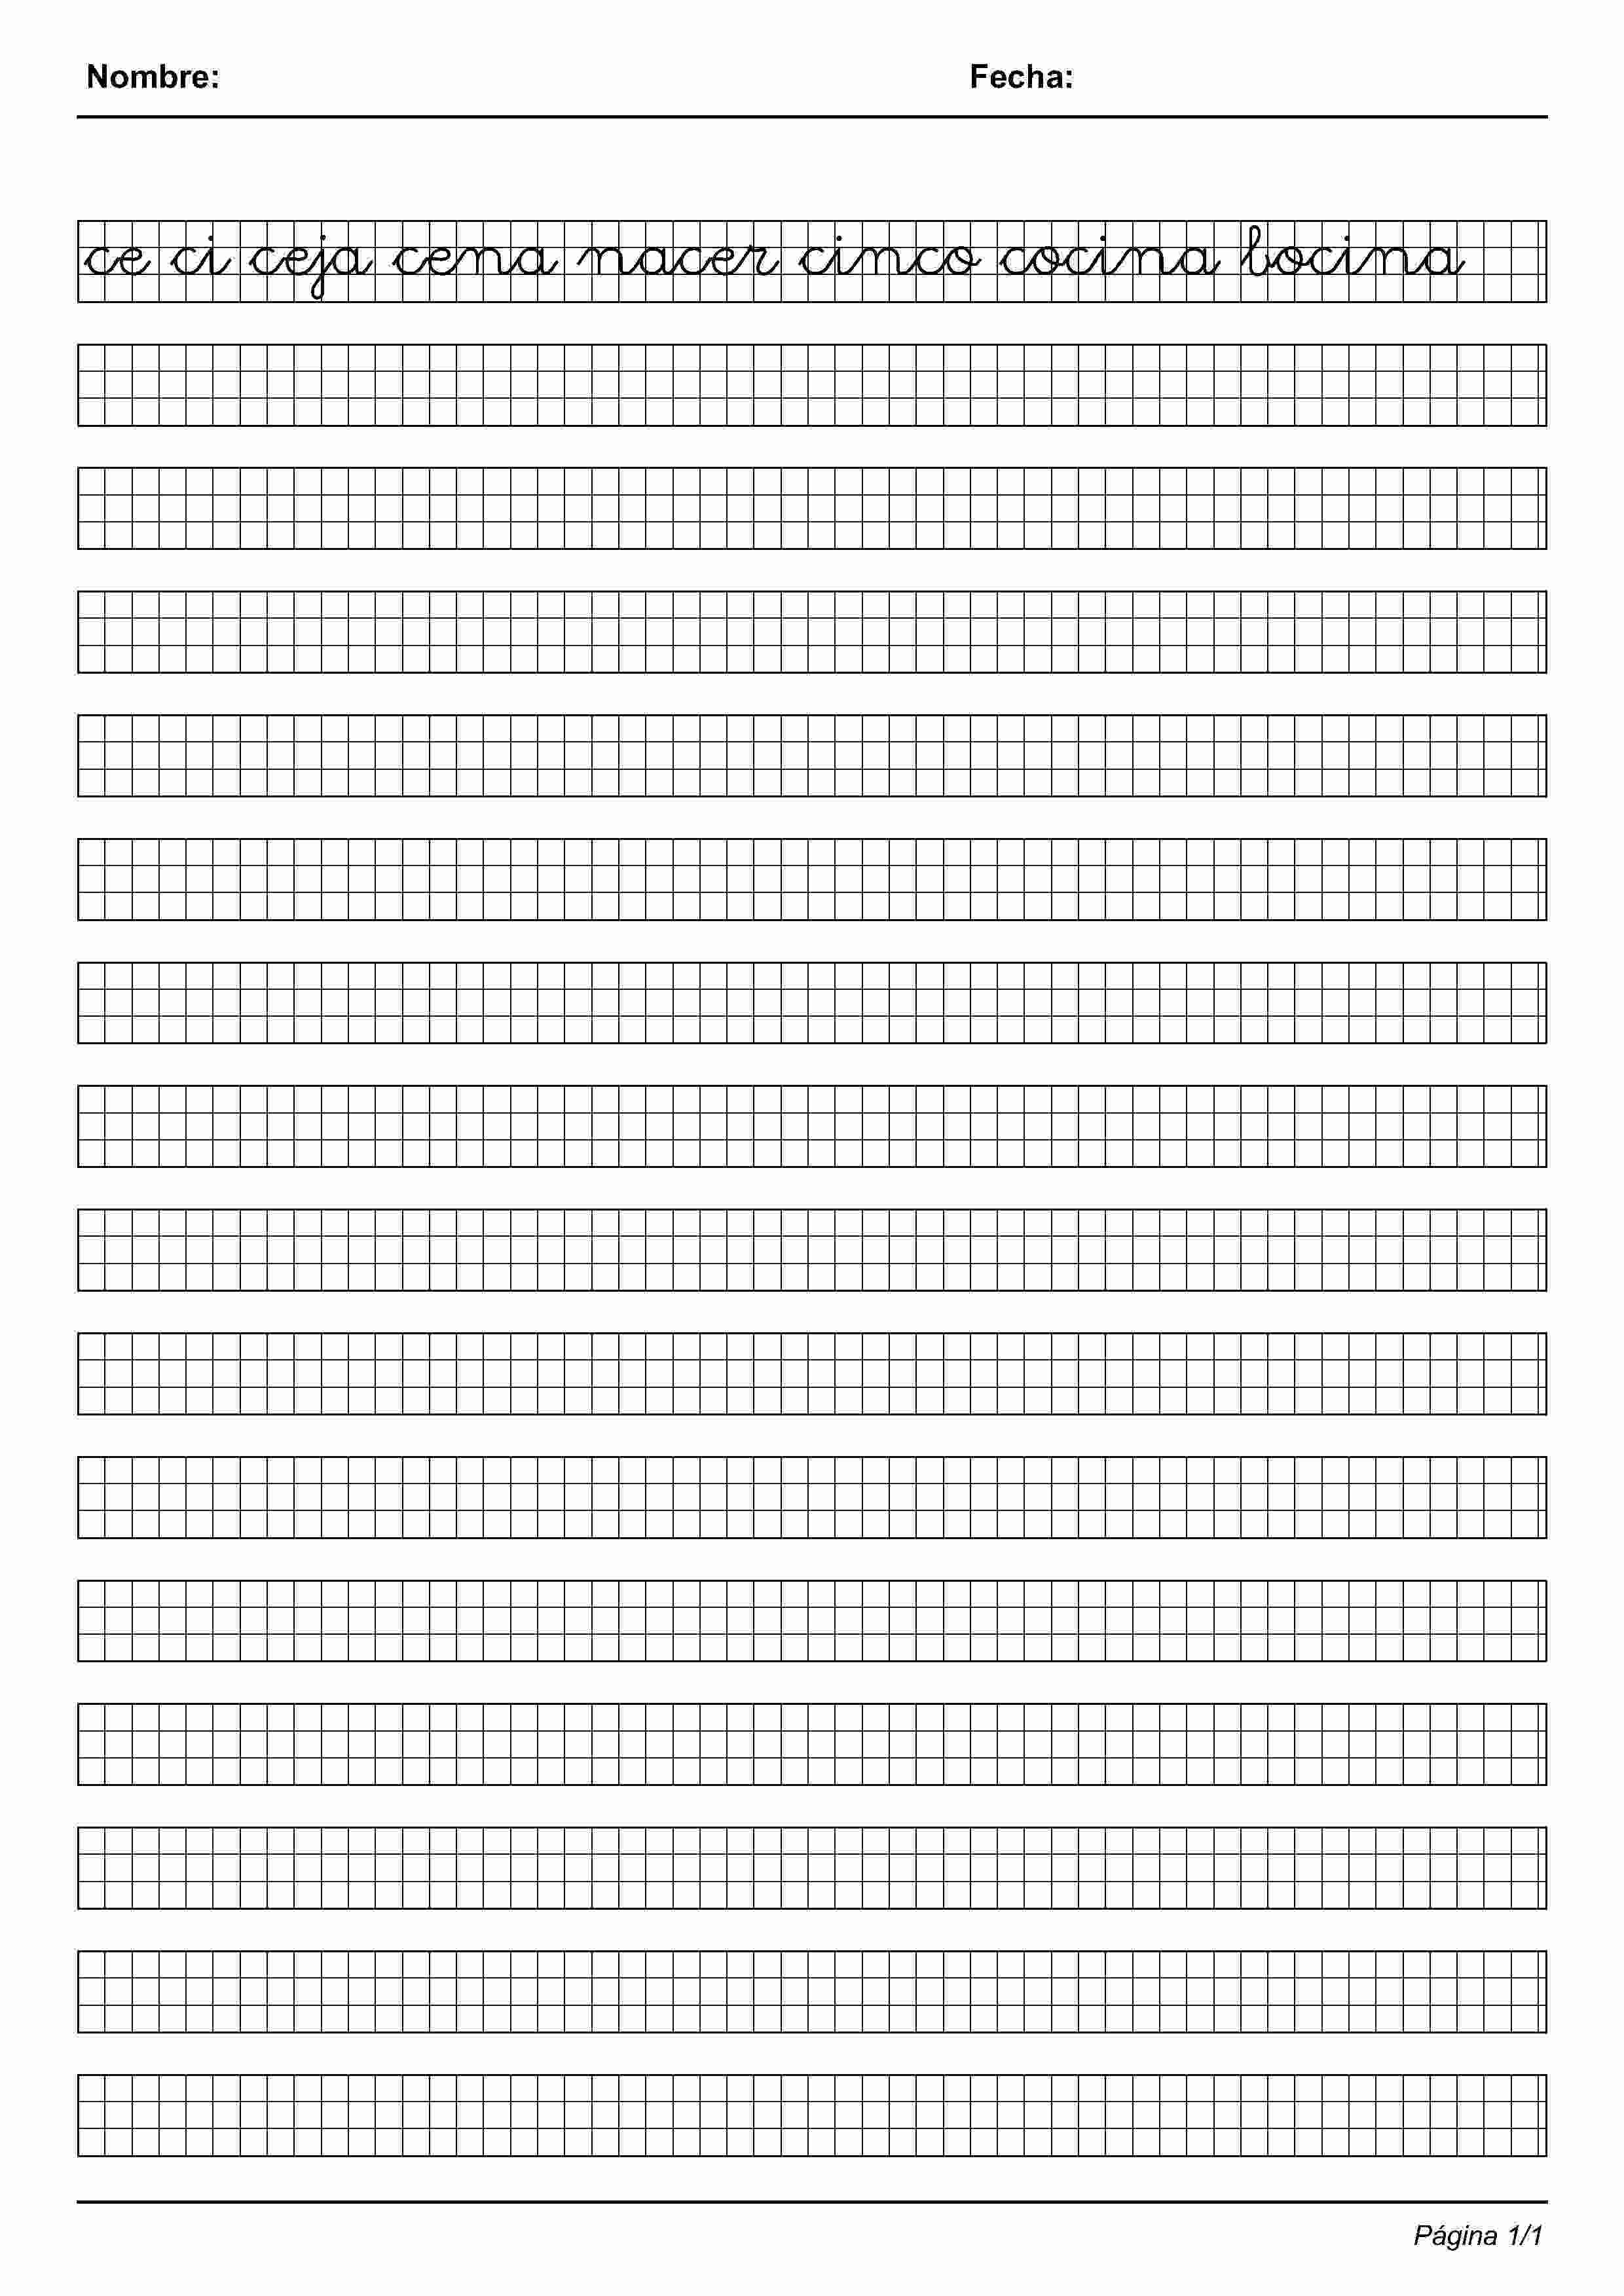 Actividades para niños preescolar, primaria e inicial. Imprimir fichas de caligrafia en cuadricula para niños de preescolar y primaria. Caligrafia en Cuadricula. 95